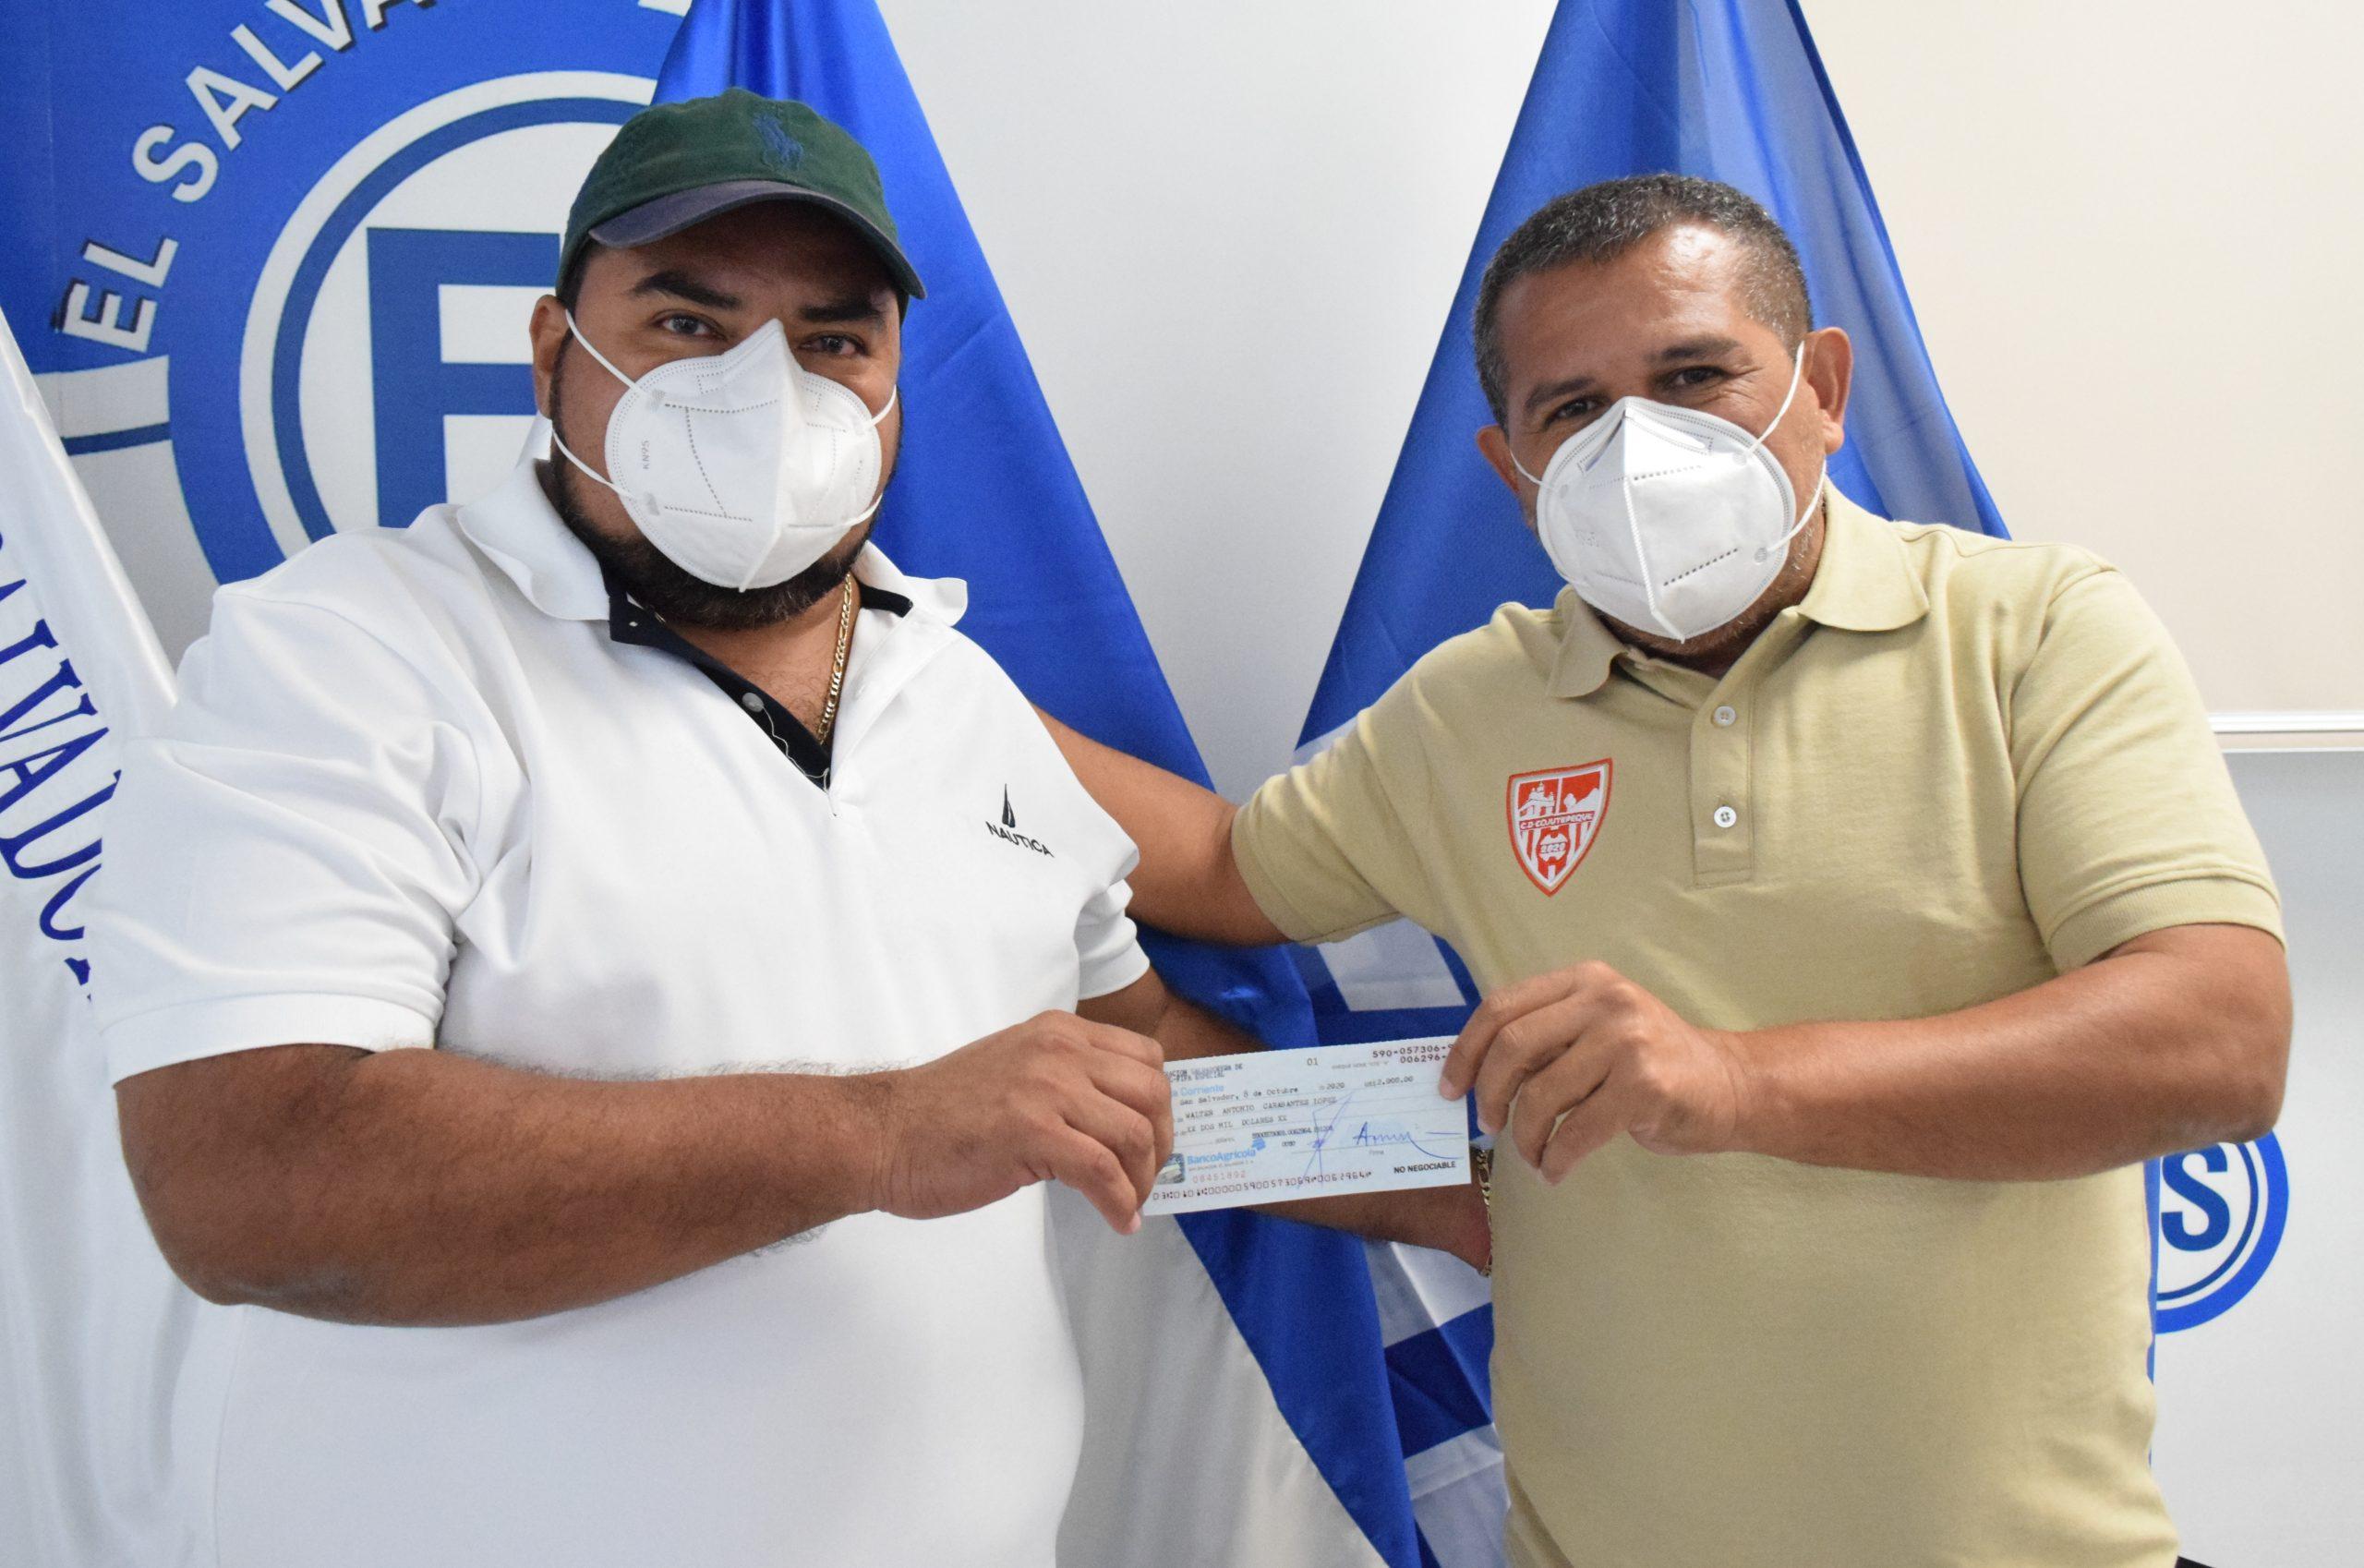 Presidente Walter López de Club Deportivo Talleres JR de Tejutla, Chalatenango